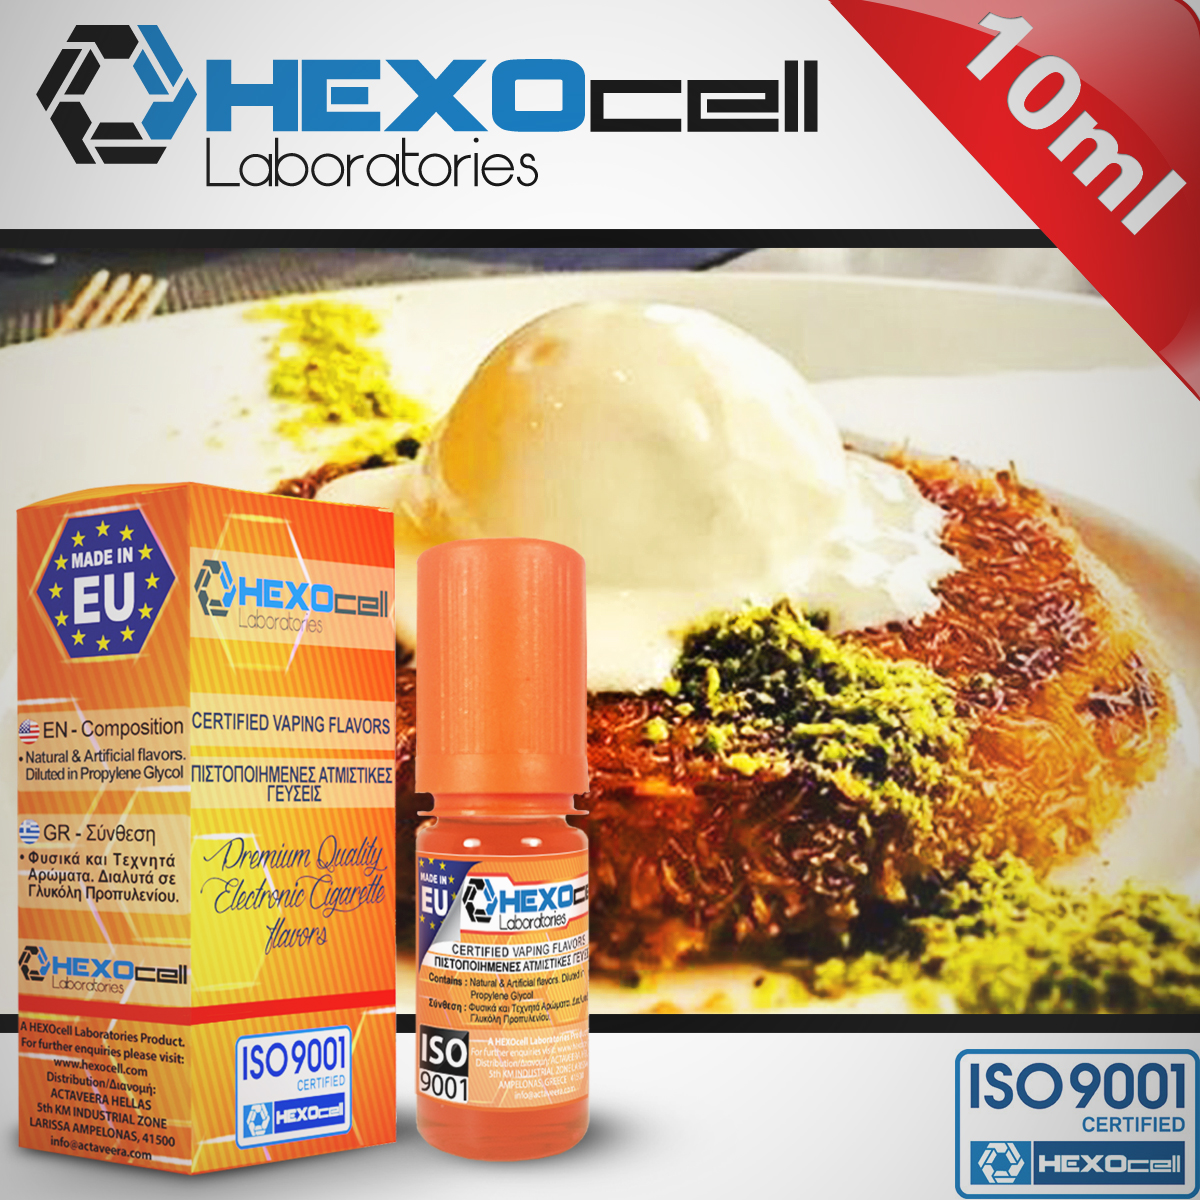 Diy 10ml istanbul sunset eliquid flavor by hexocell diy 10ml istanbul sunset eliquid flavor by hexocell image 1 solutioingenieria Gallery